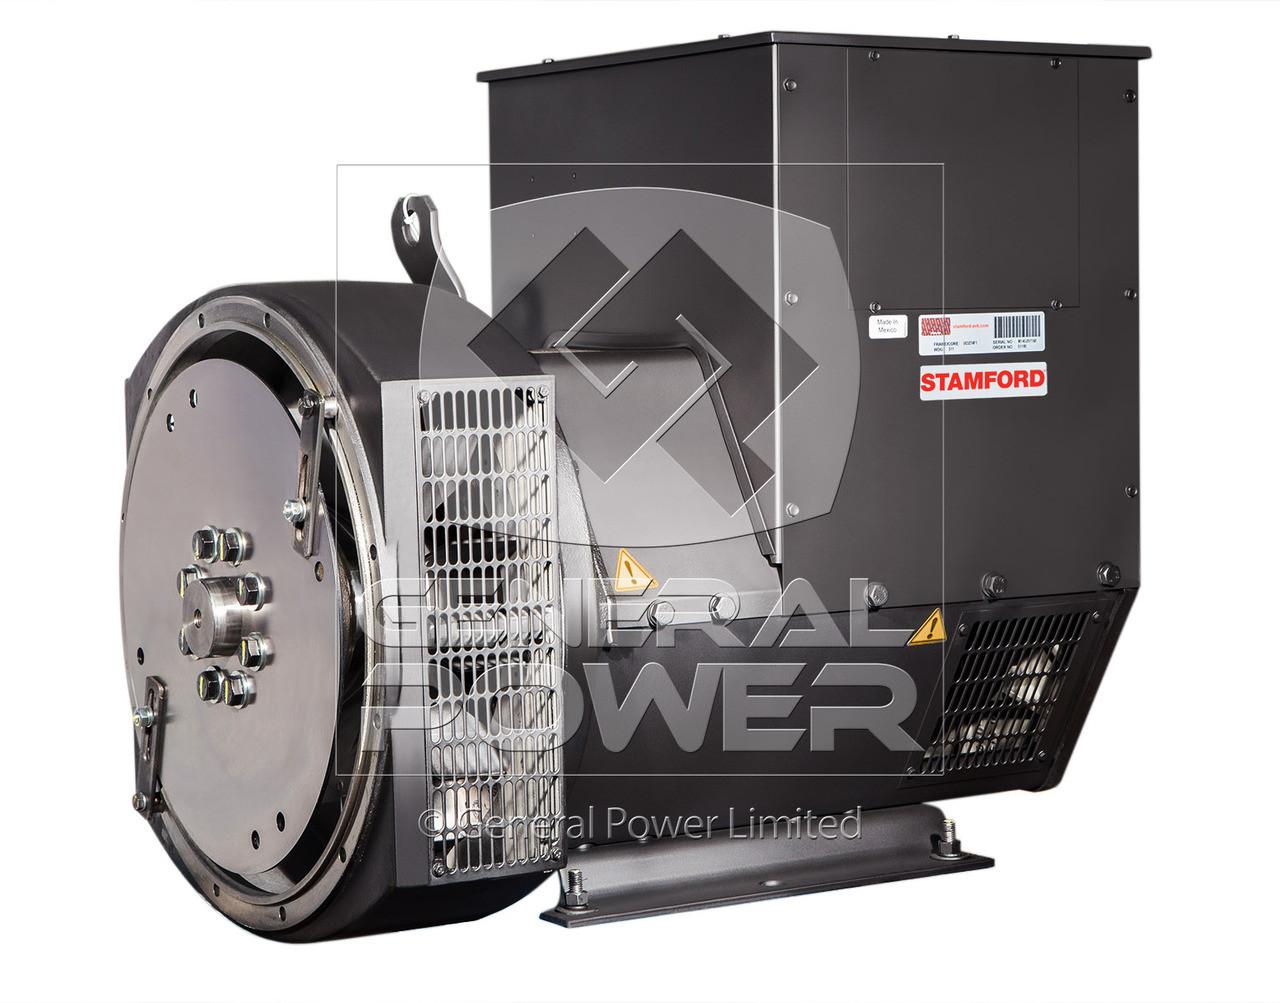 500 kW Alternator - Stamford HCI544C 3 Phase | General Power Newage Stamford Alternator Wiring Diagram on